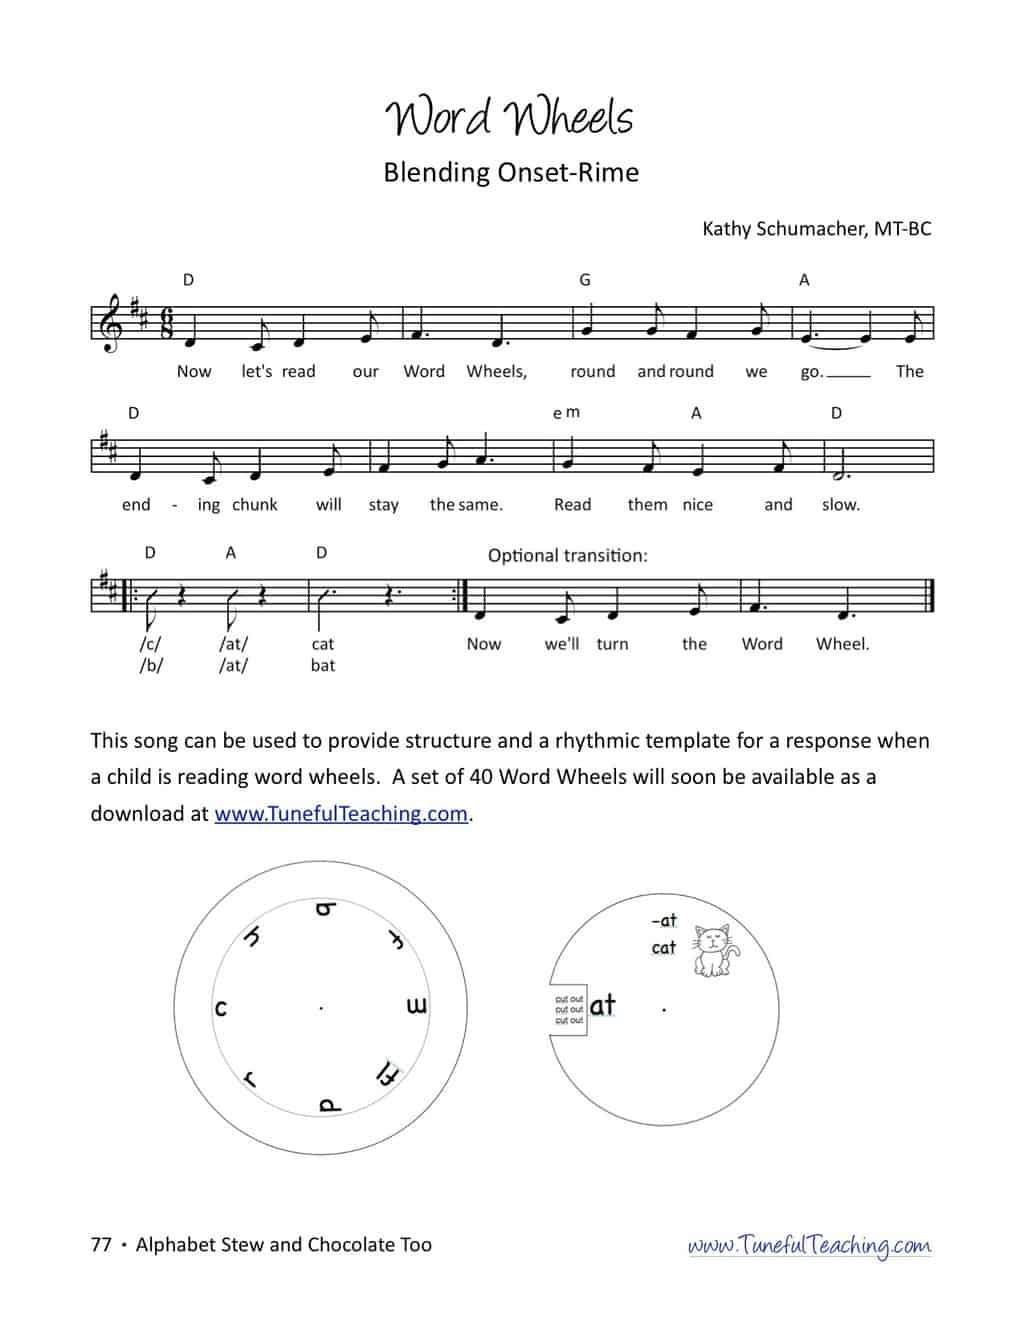 Alphabet Stew And Chocolate Too Literacy Through Music